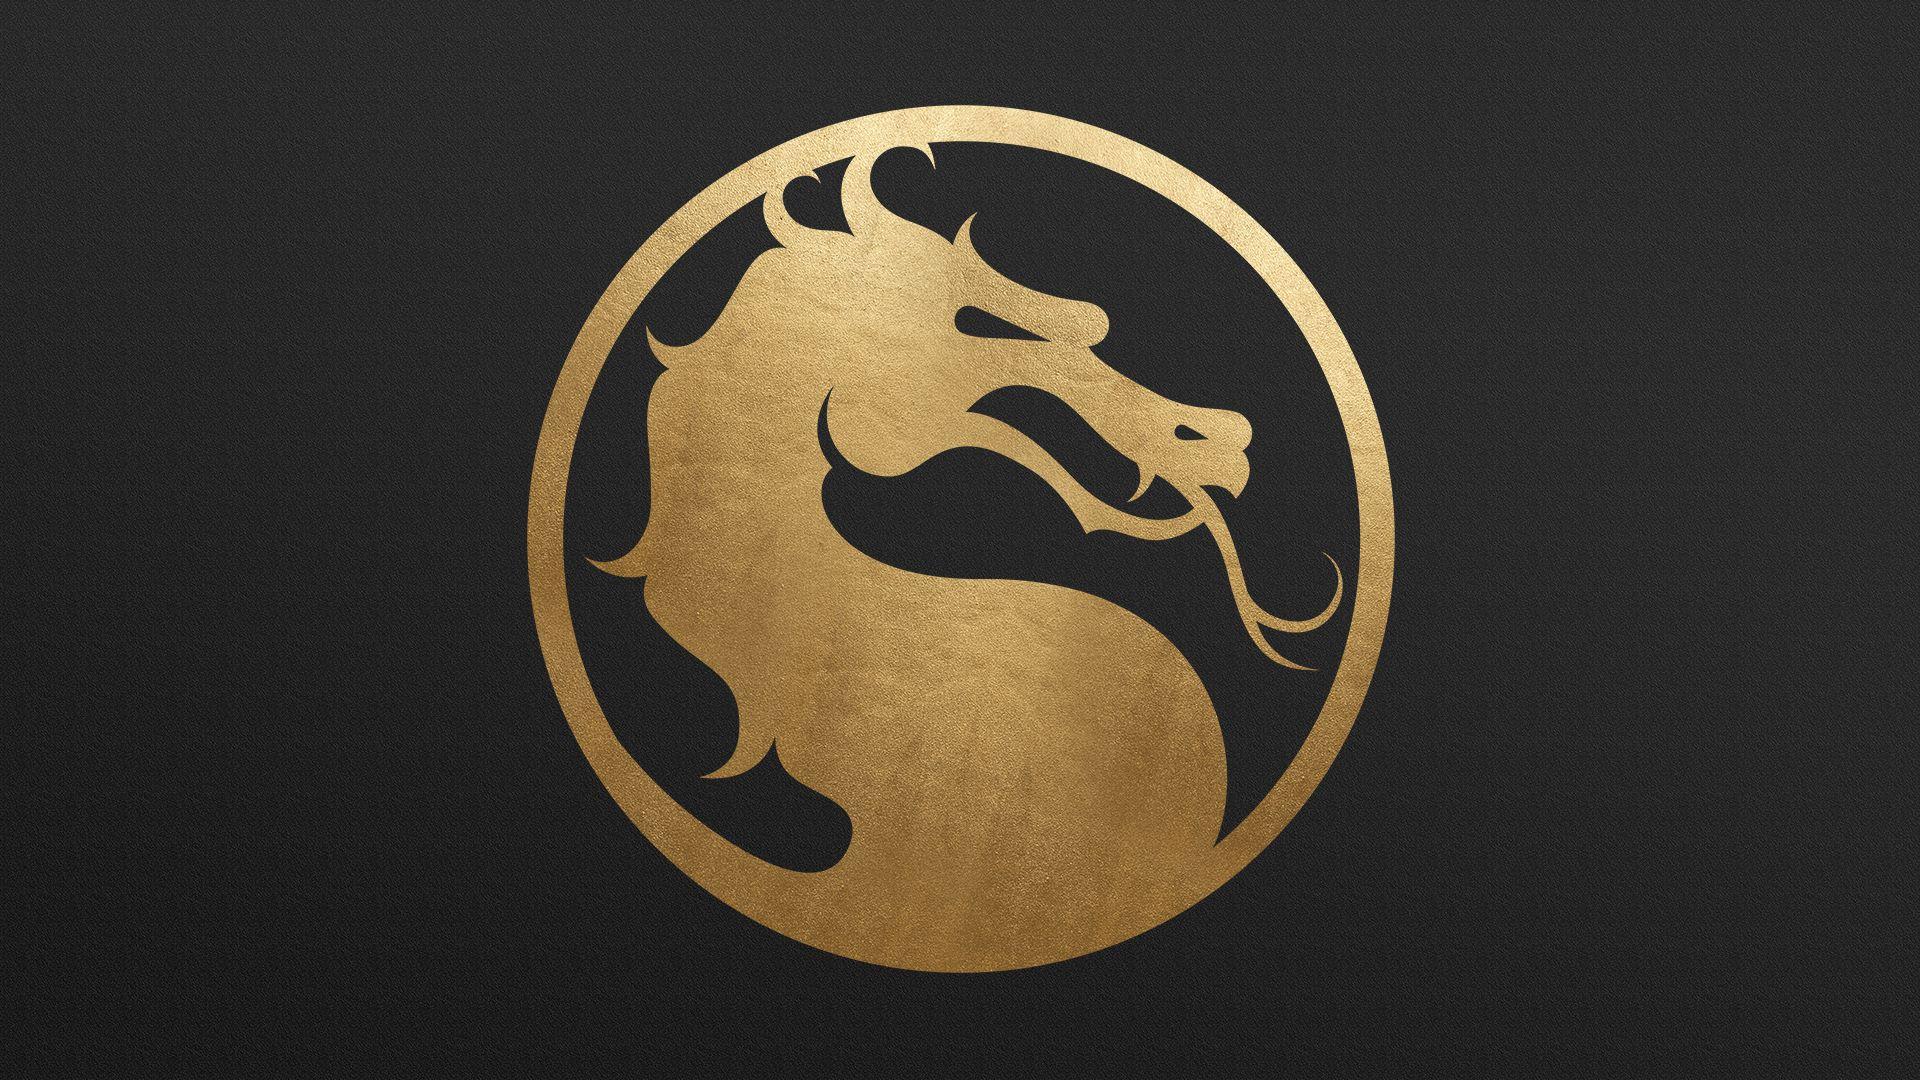 Mortal Kombat 11 împinge brutalitatea la noi culmi